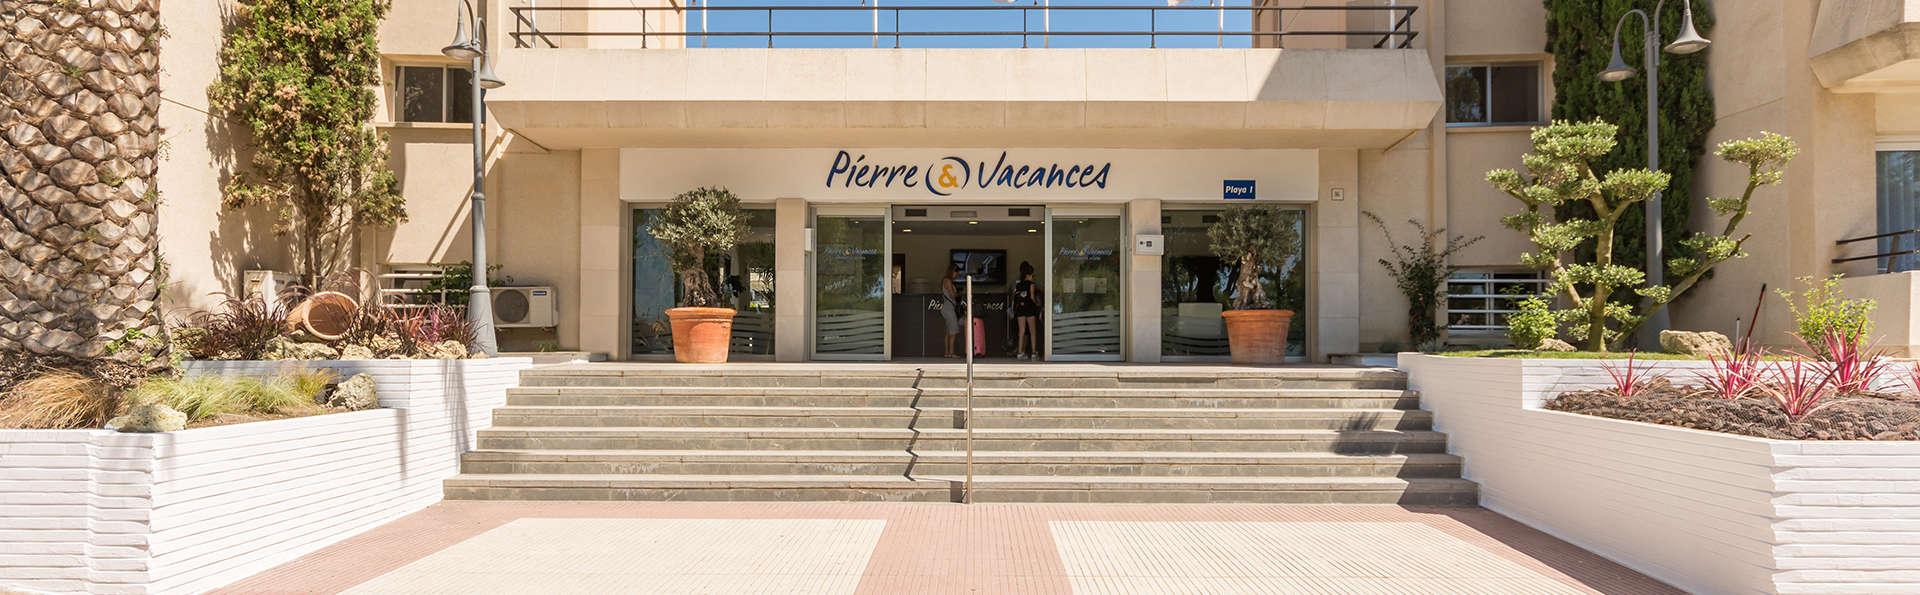 Pierre et Vacances Estartit Playa - EDIT_NEW_Front.jpg